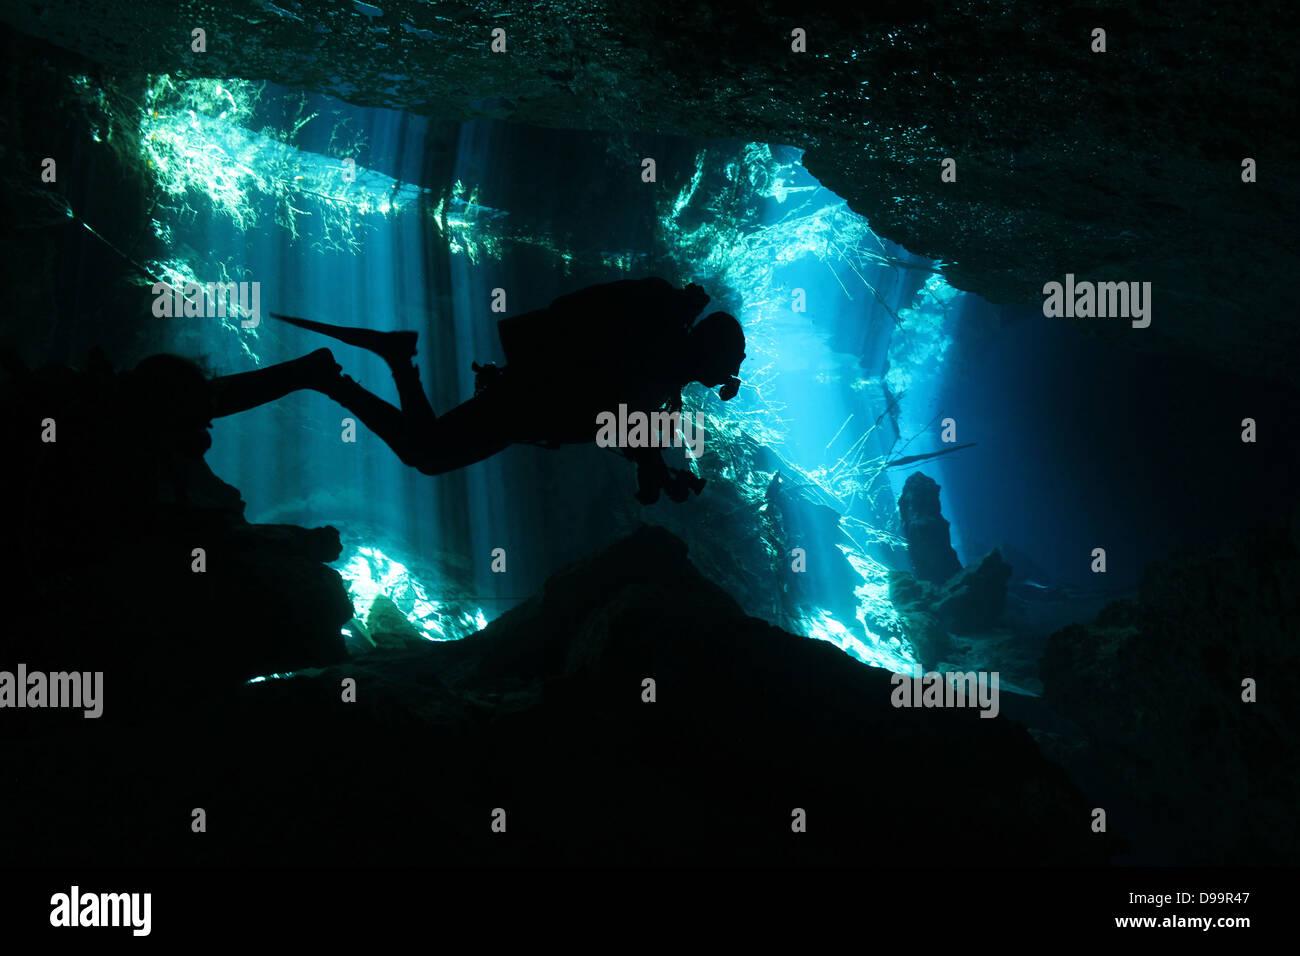 Diver in Chac-Mool Cenote, Playa del Carmen, Mexico - Stock Image